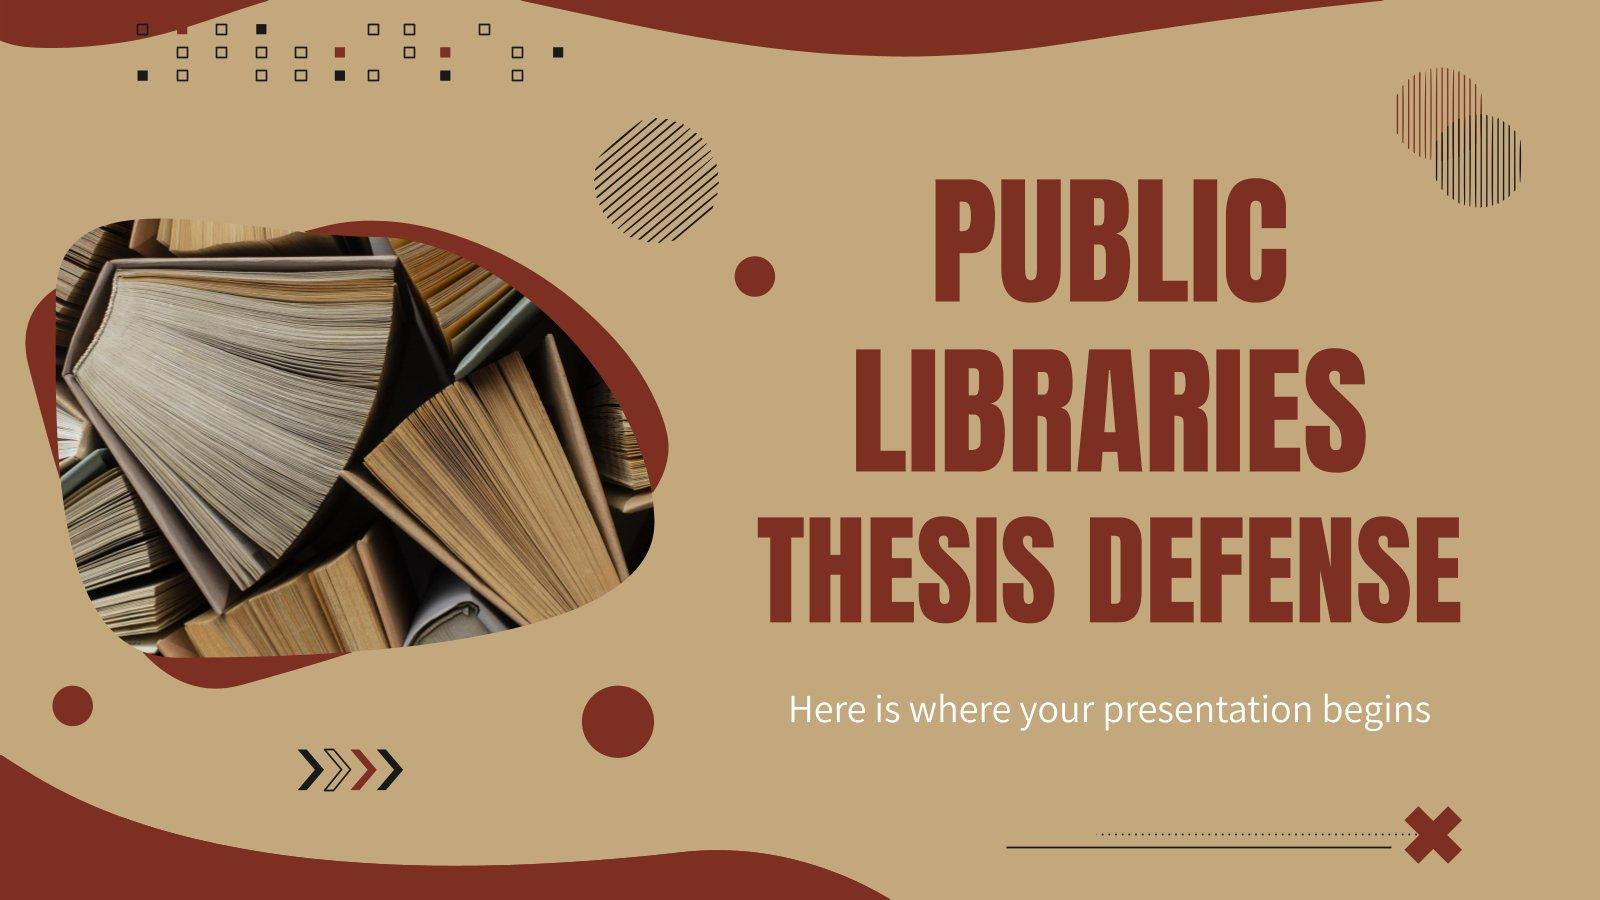 Public Libraries Thesis Defense presentation template